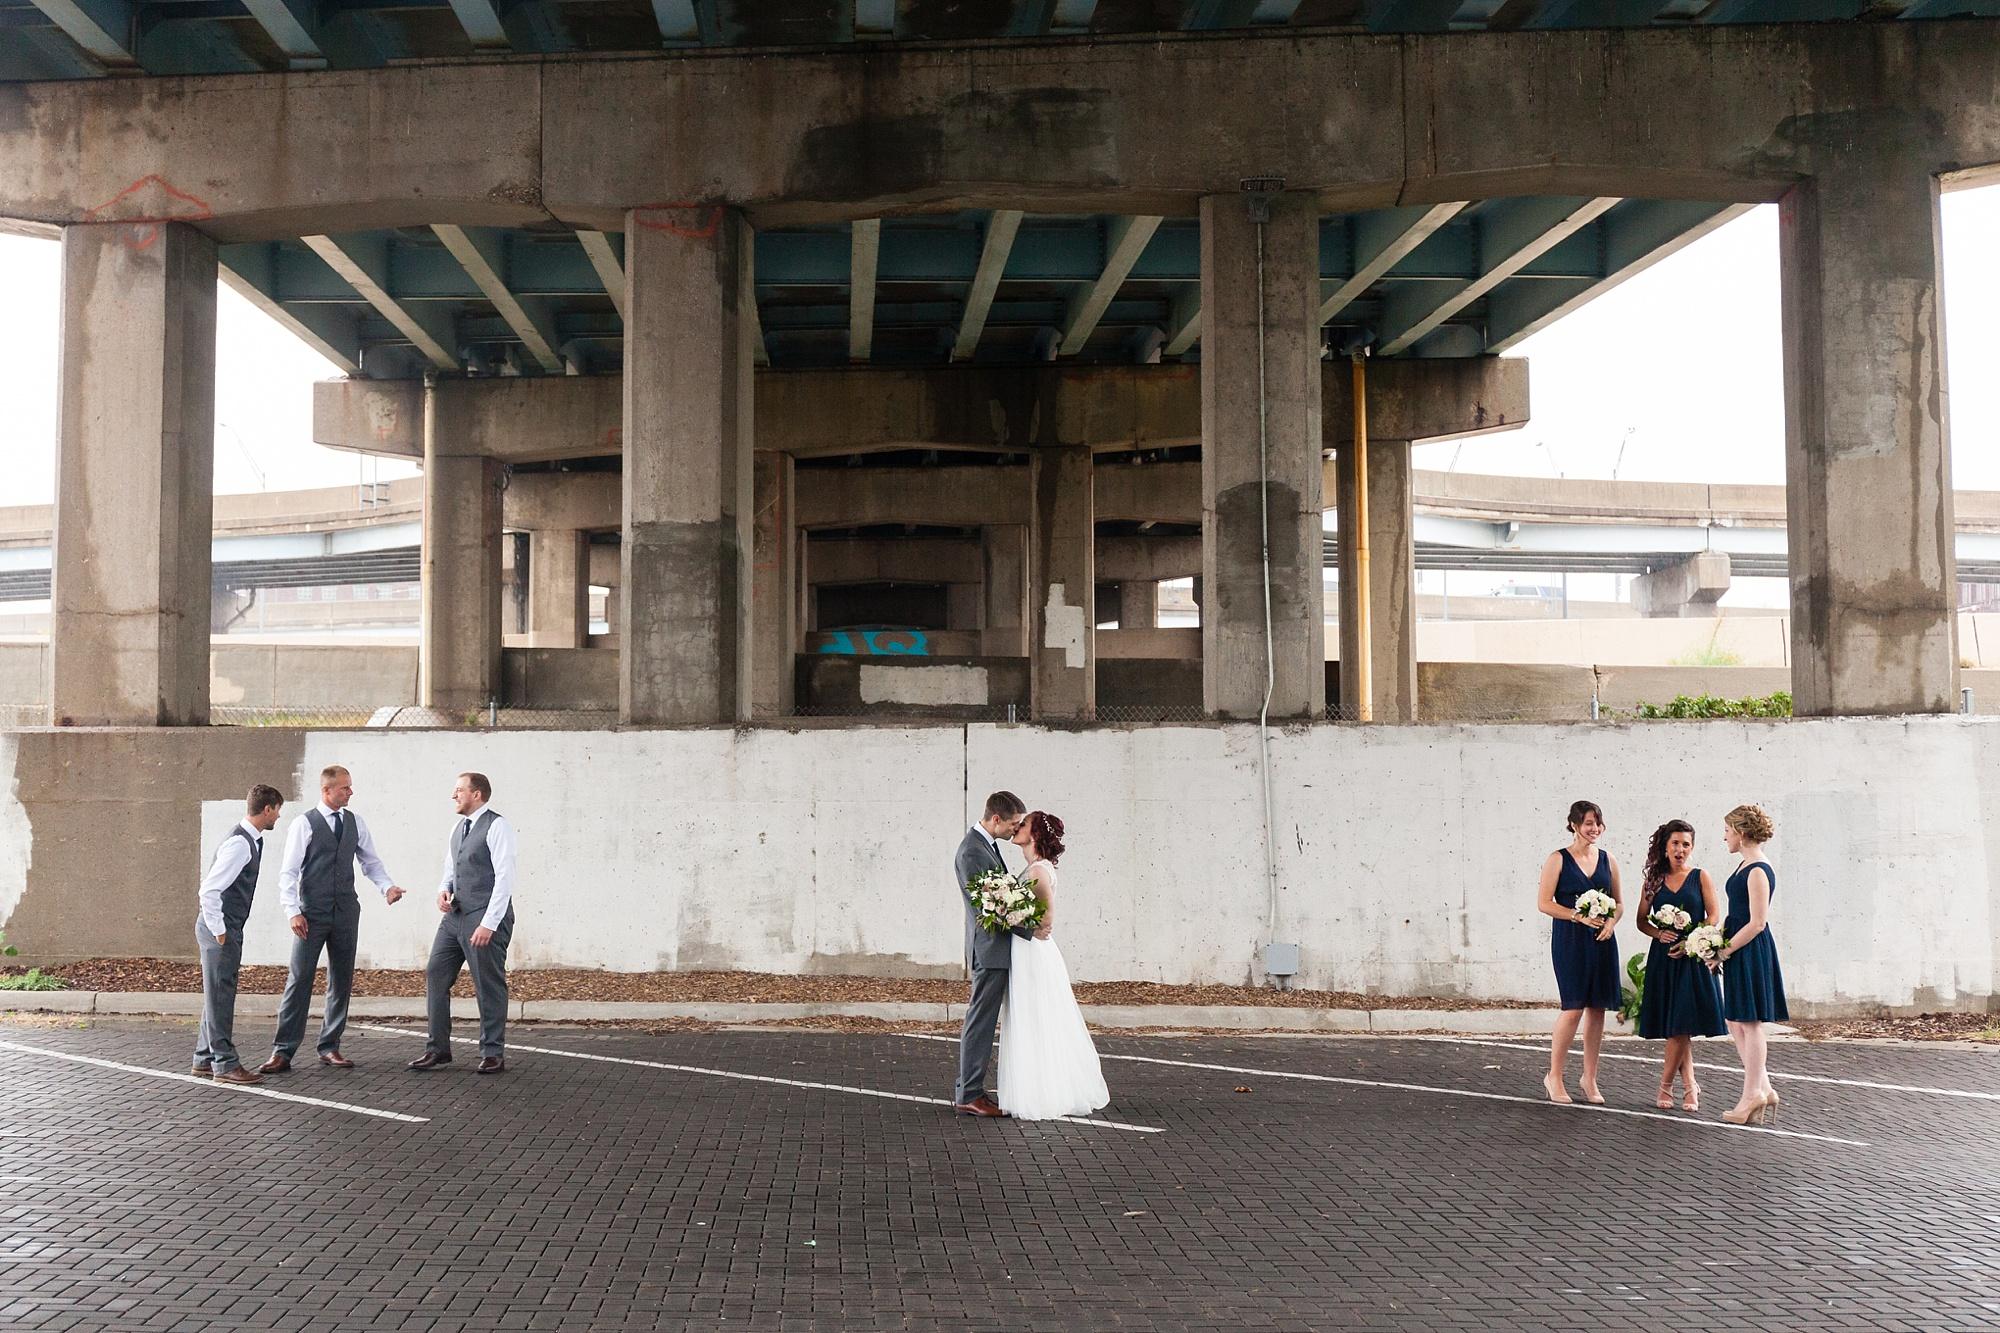 Brandon_Shafer_Photography_Lauren_Ethan_New_Vintage_Place_Grand_Rapids_Wedding_0030.jpg